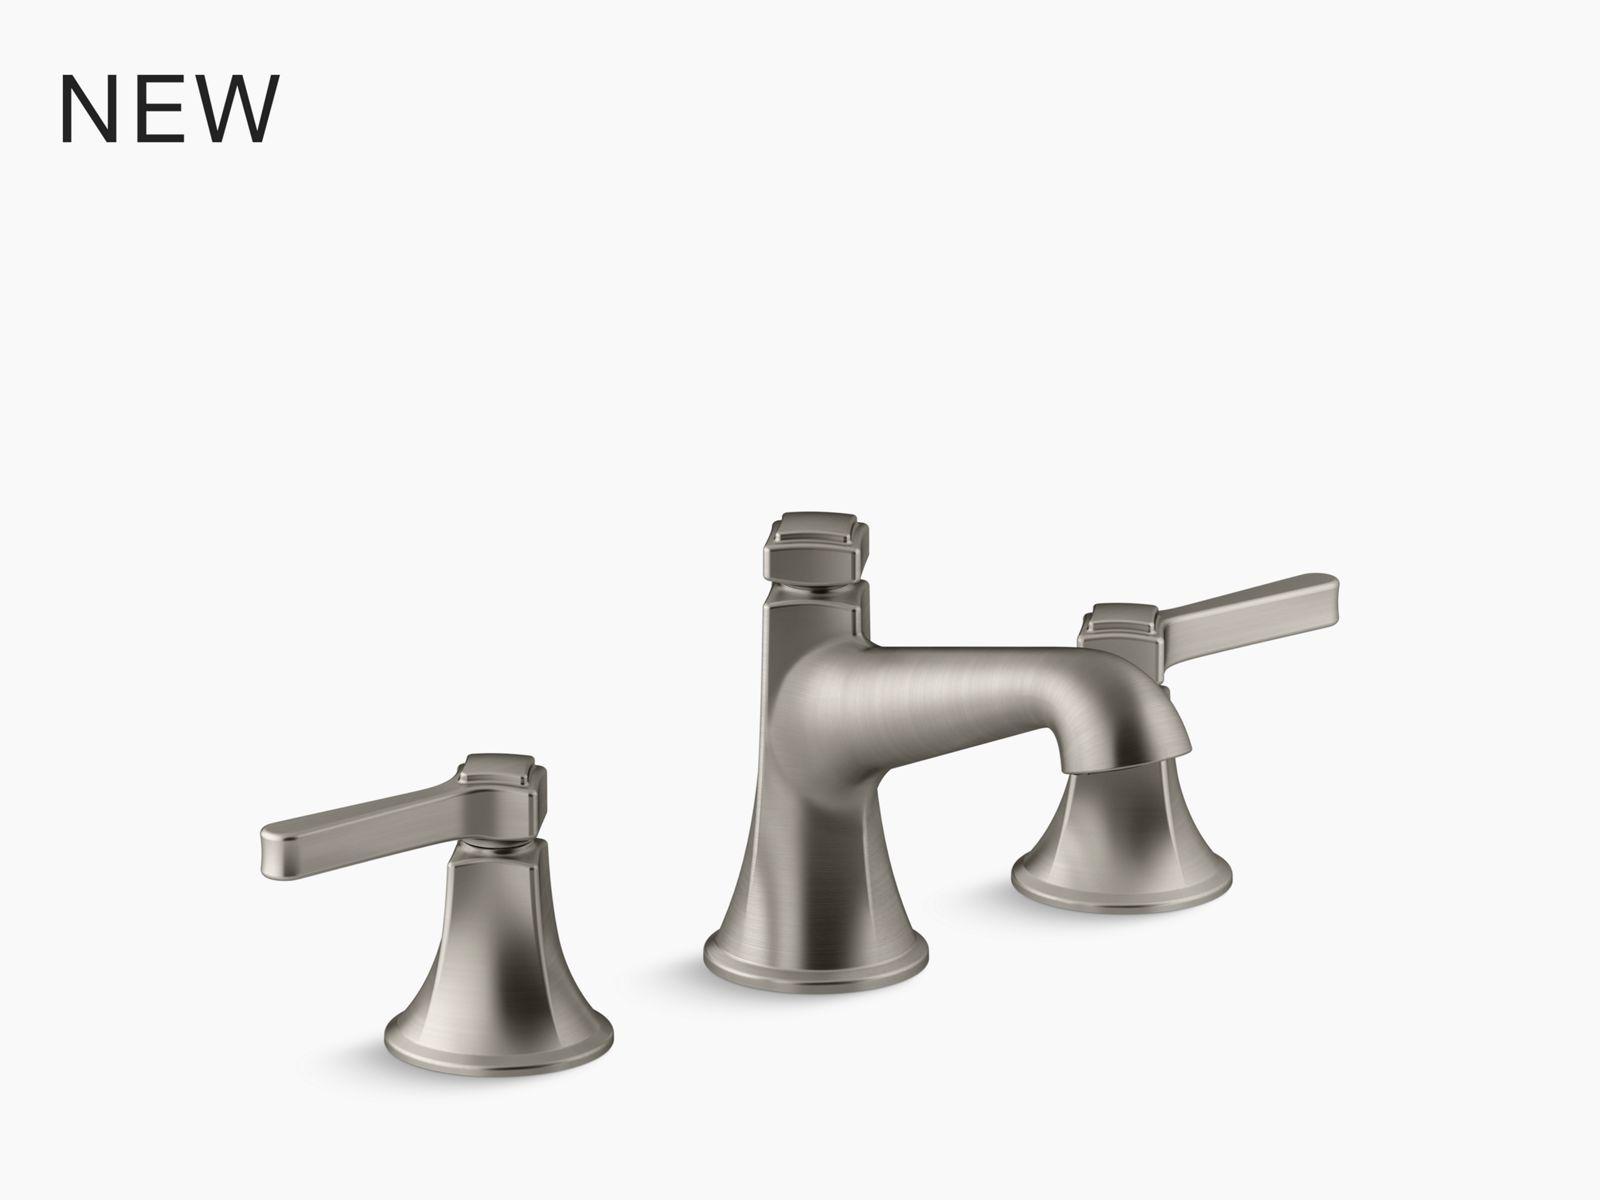 fairfax 4 hole kitchen sink faucet